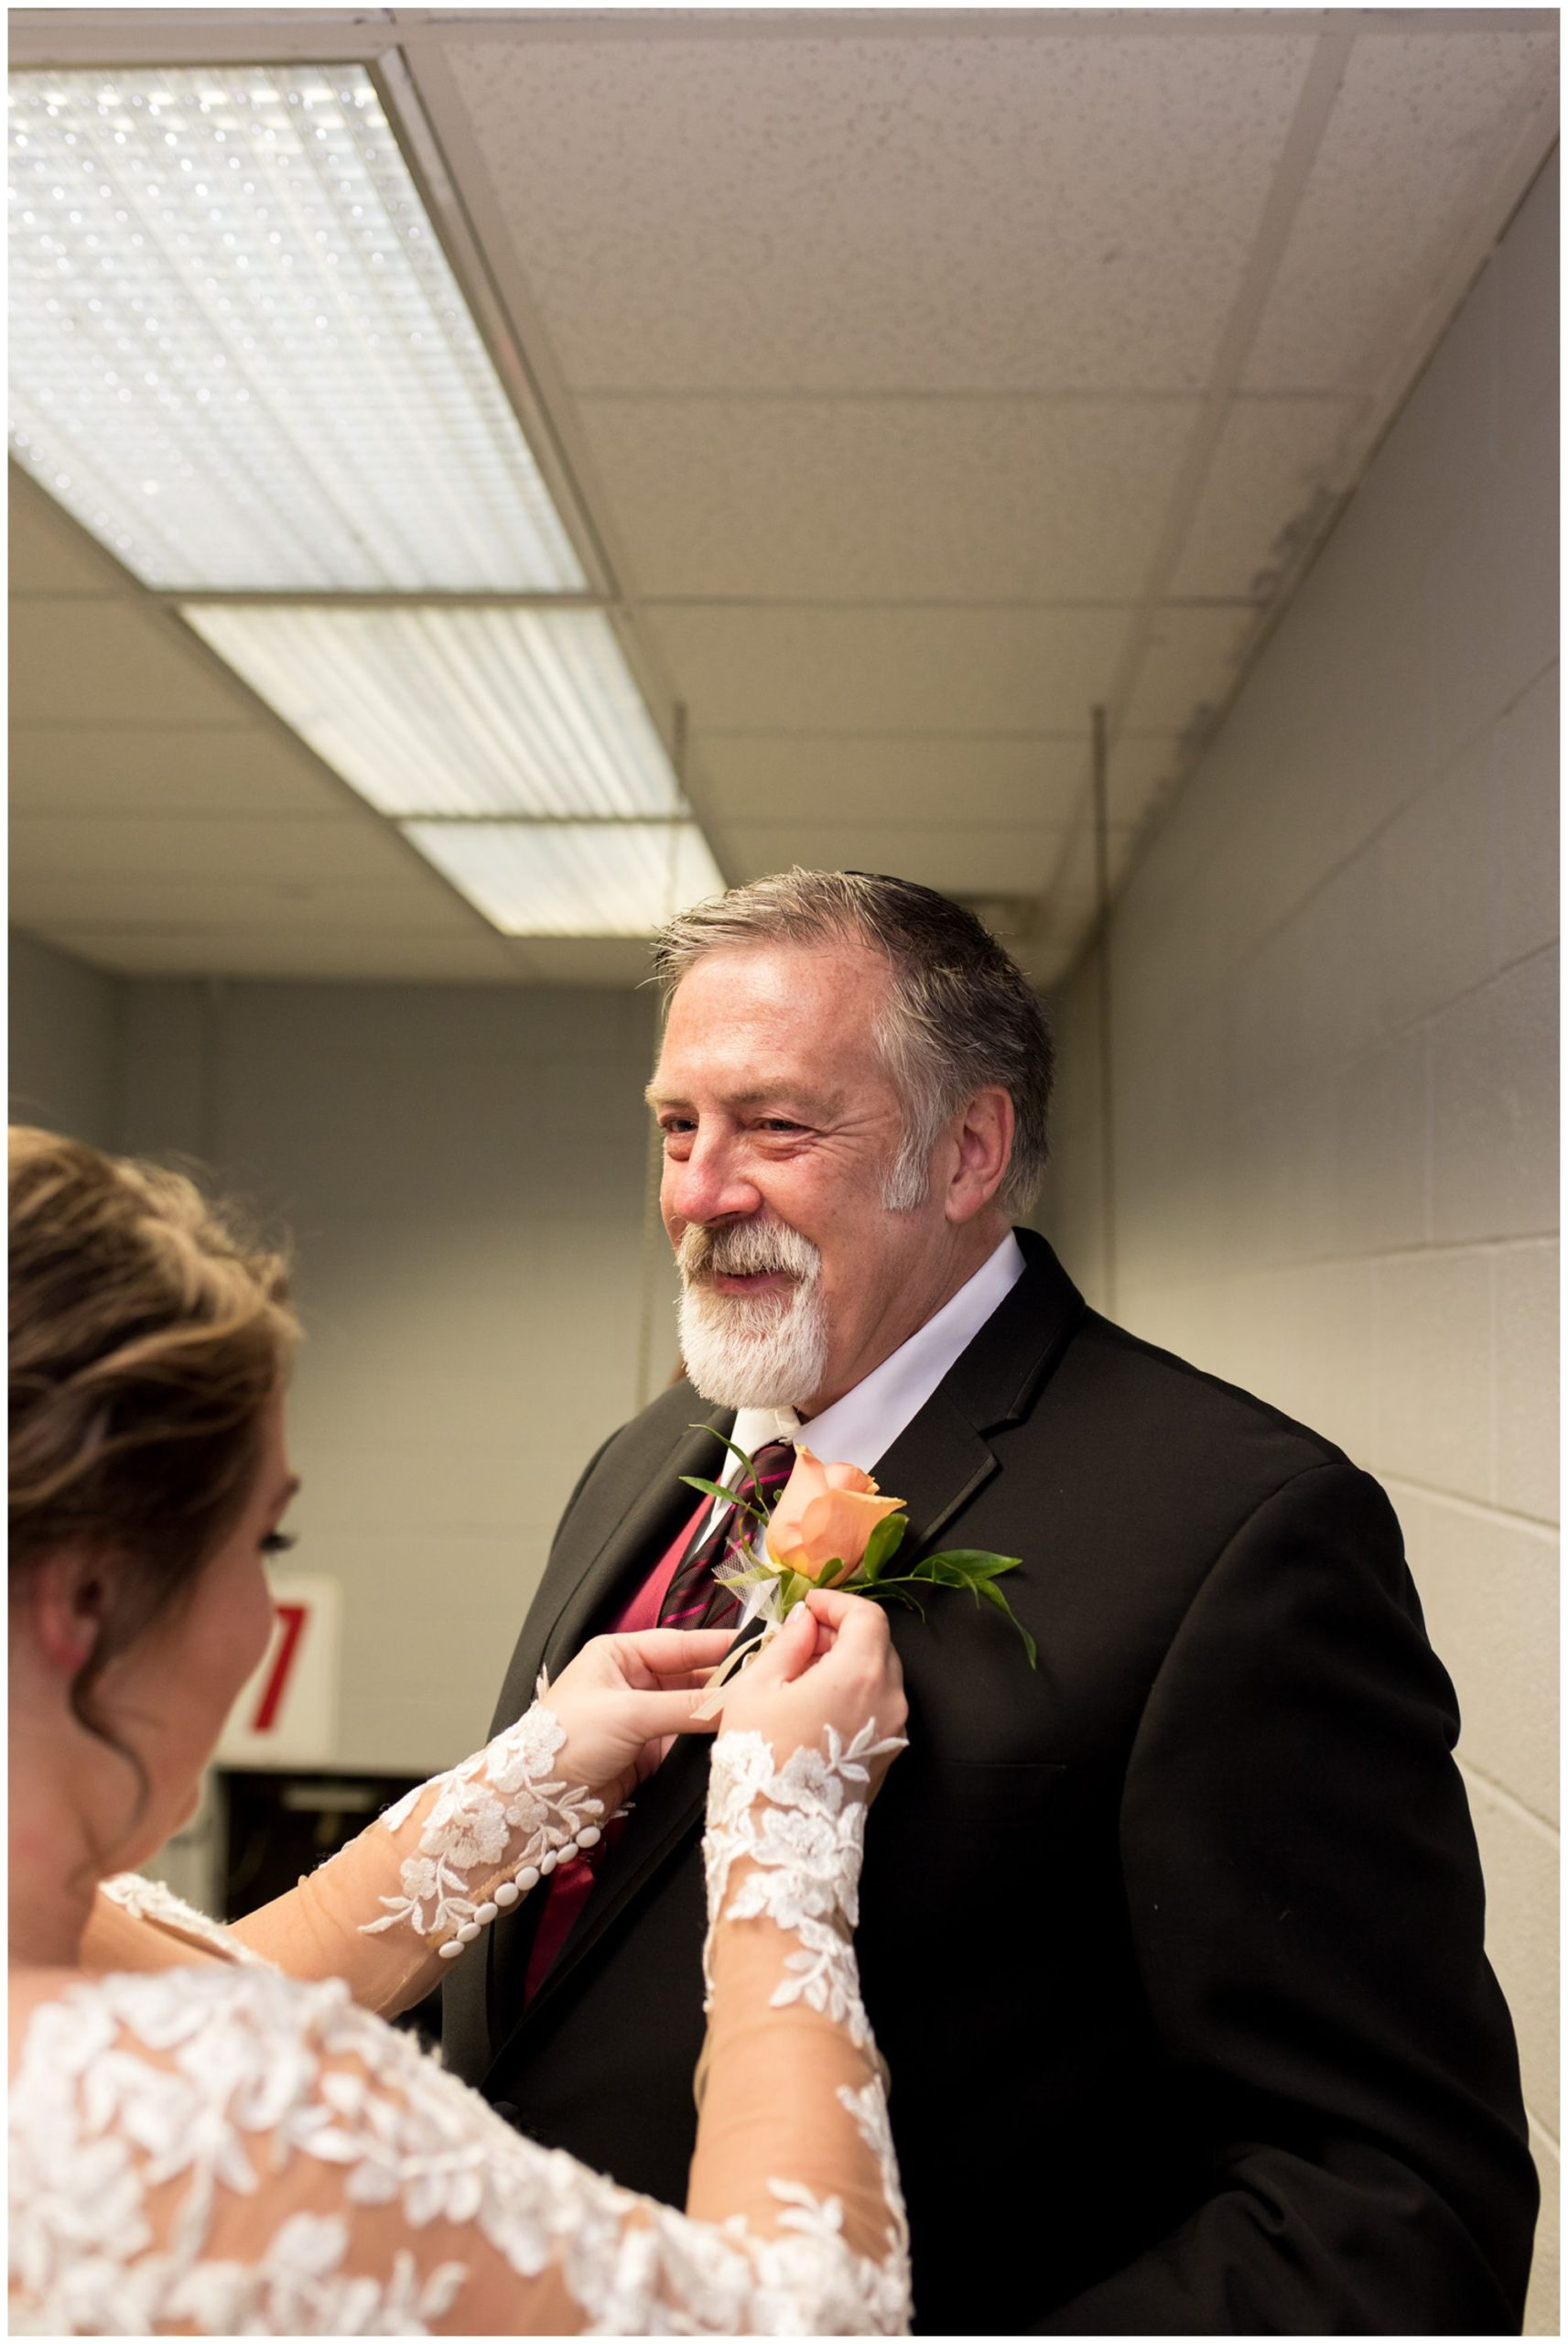 bride pins boutonniere on dad's jacket before Zion Lutheran Church wedding